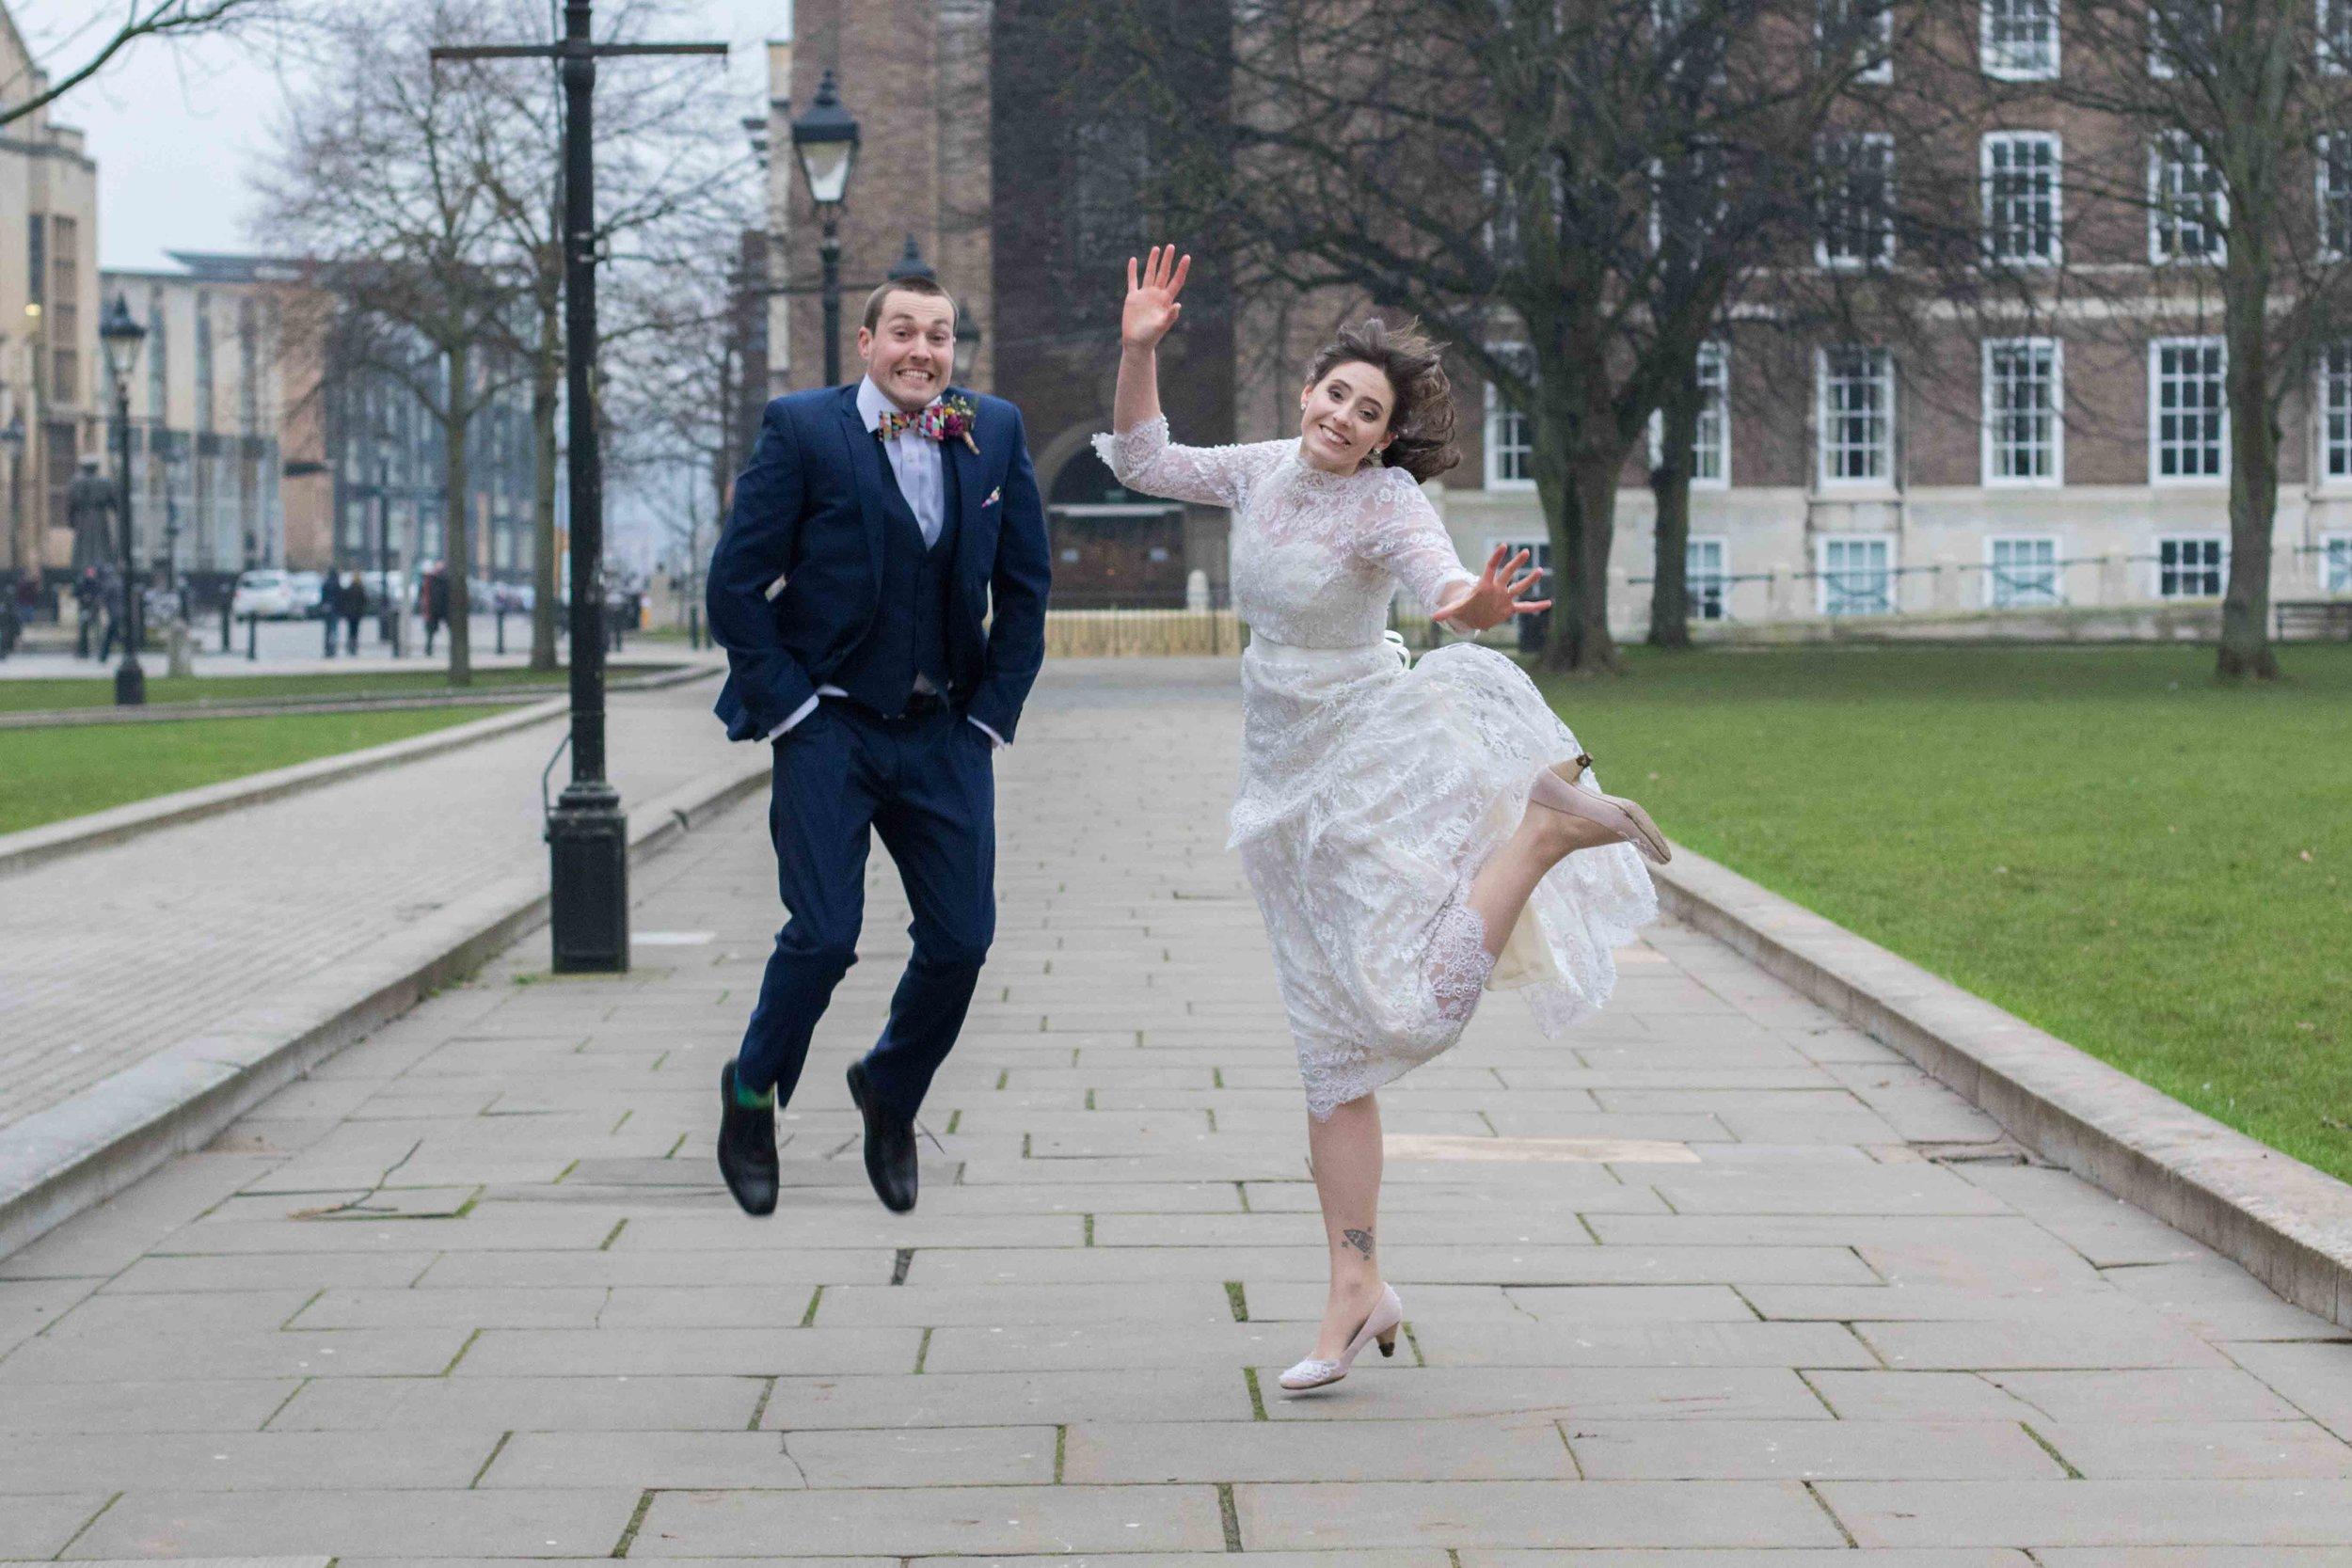 Adam & Faye - Wright Wedding Photography - Bristol Wedding Photographer -286.jpg